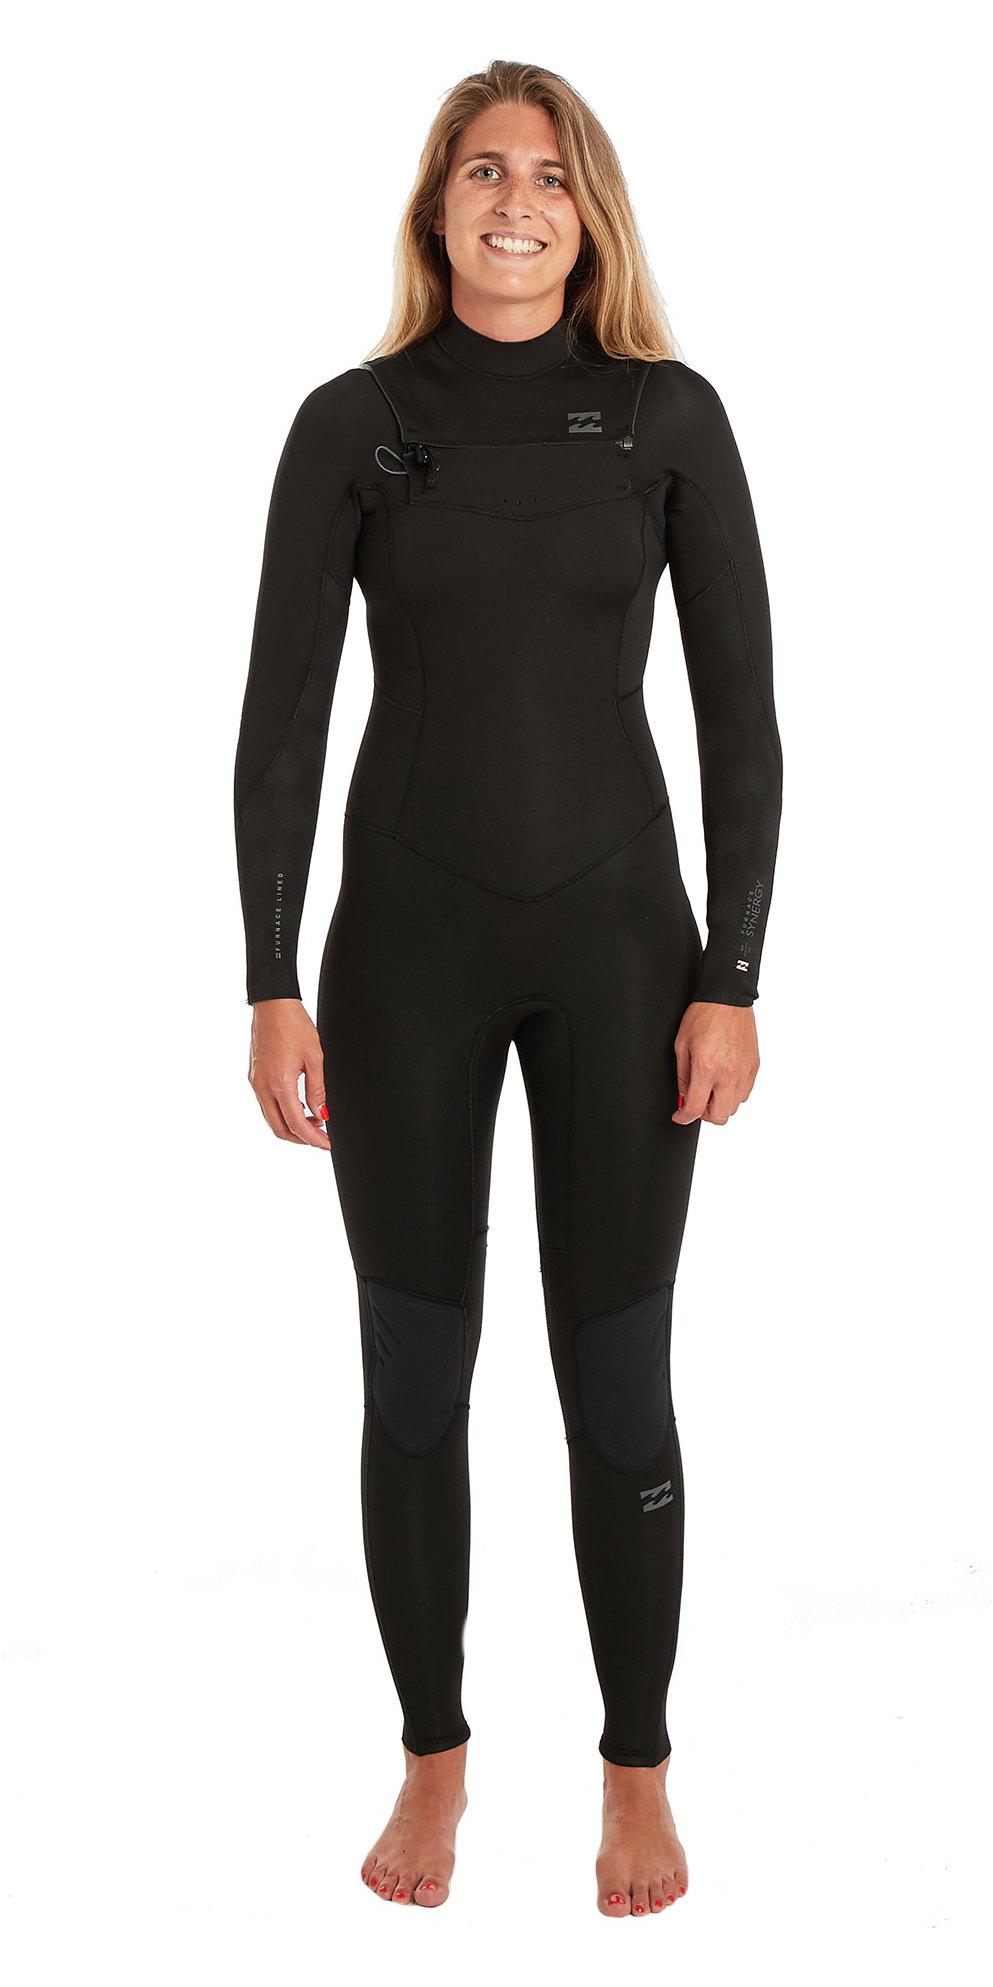 2019 Billabong Womens Furnace Synergy 3 2mm Chest Zip GBS Wetsuit Black  Palms N43G03 ... d9a558f78